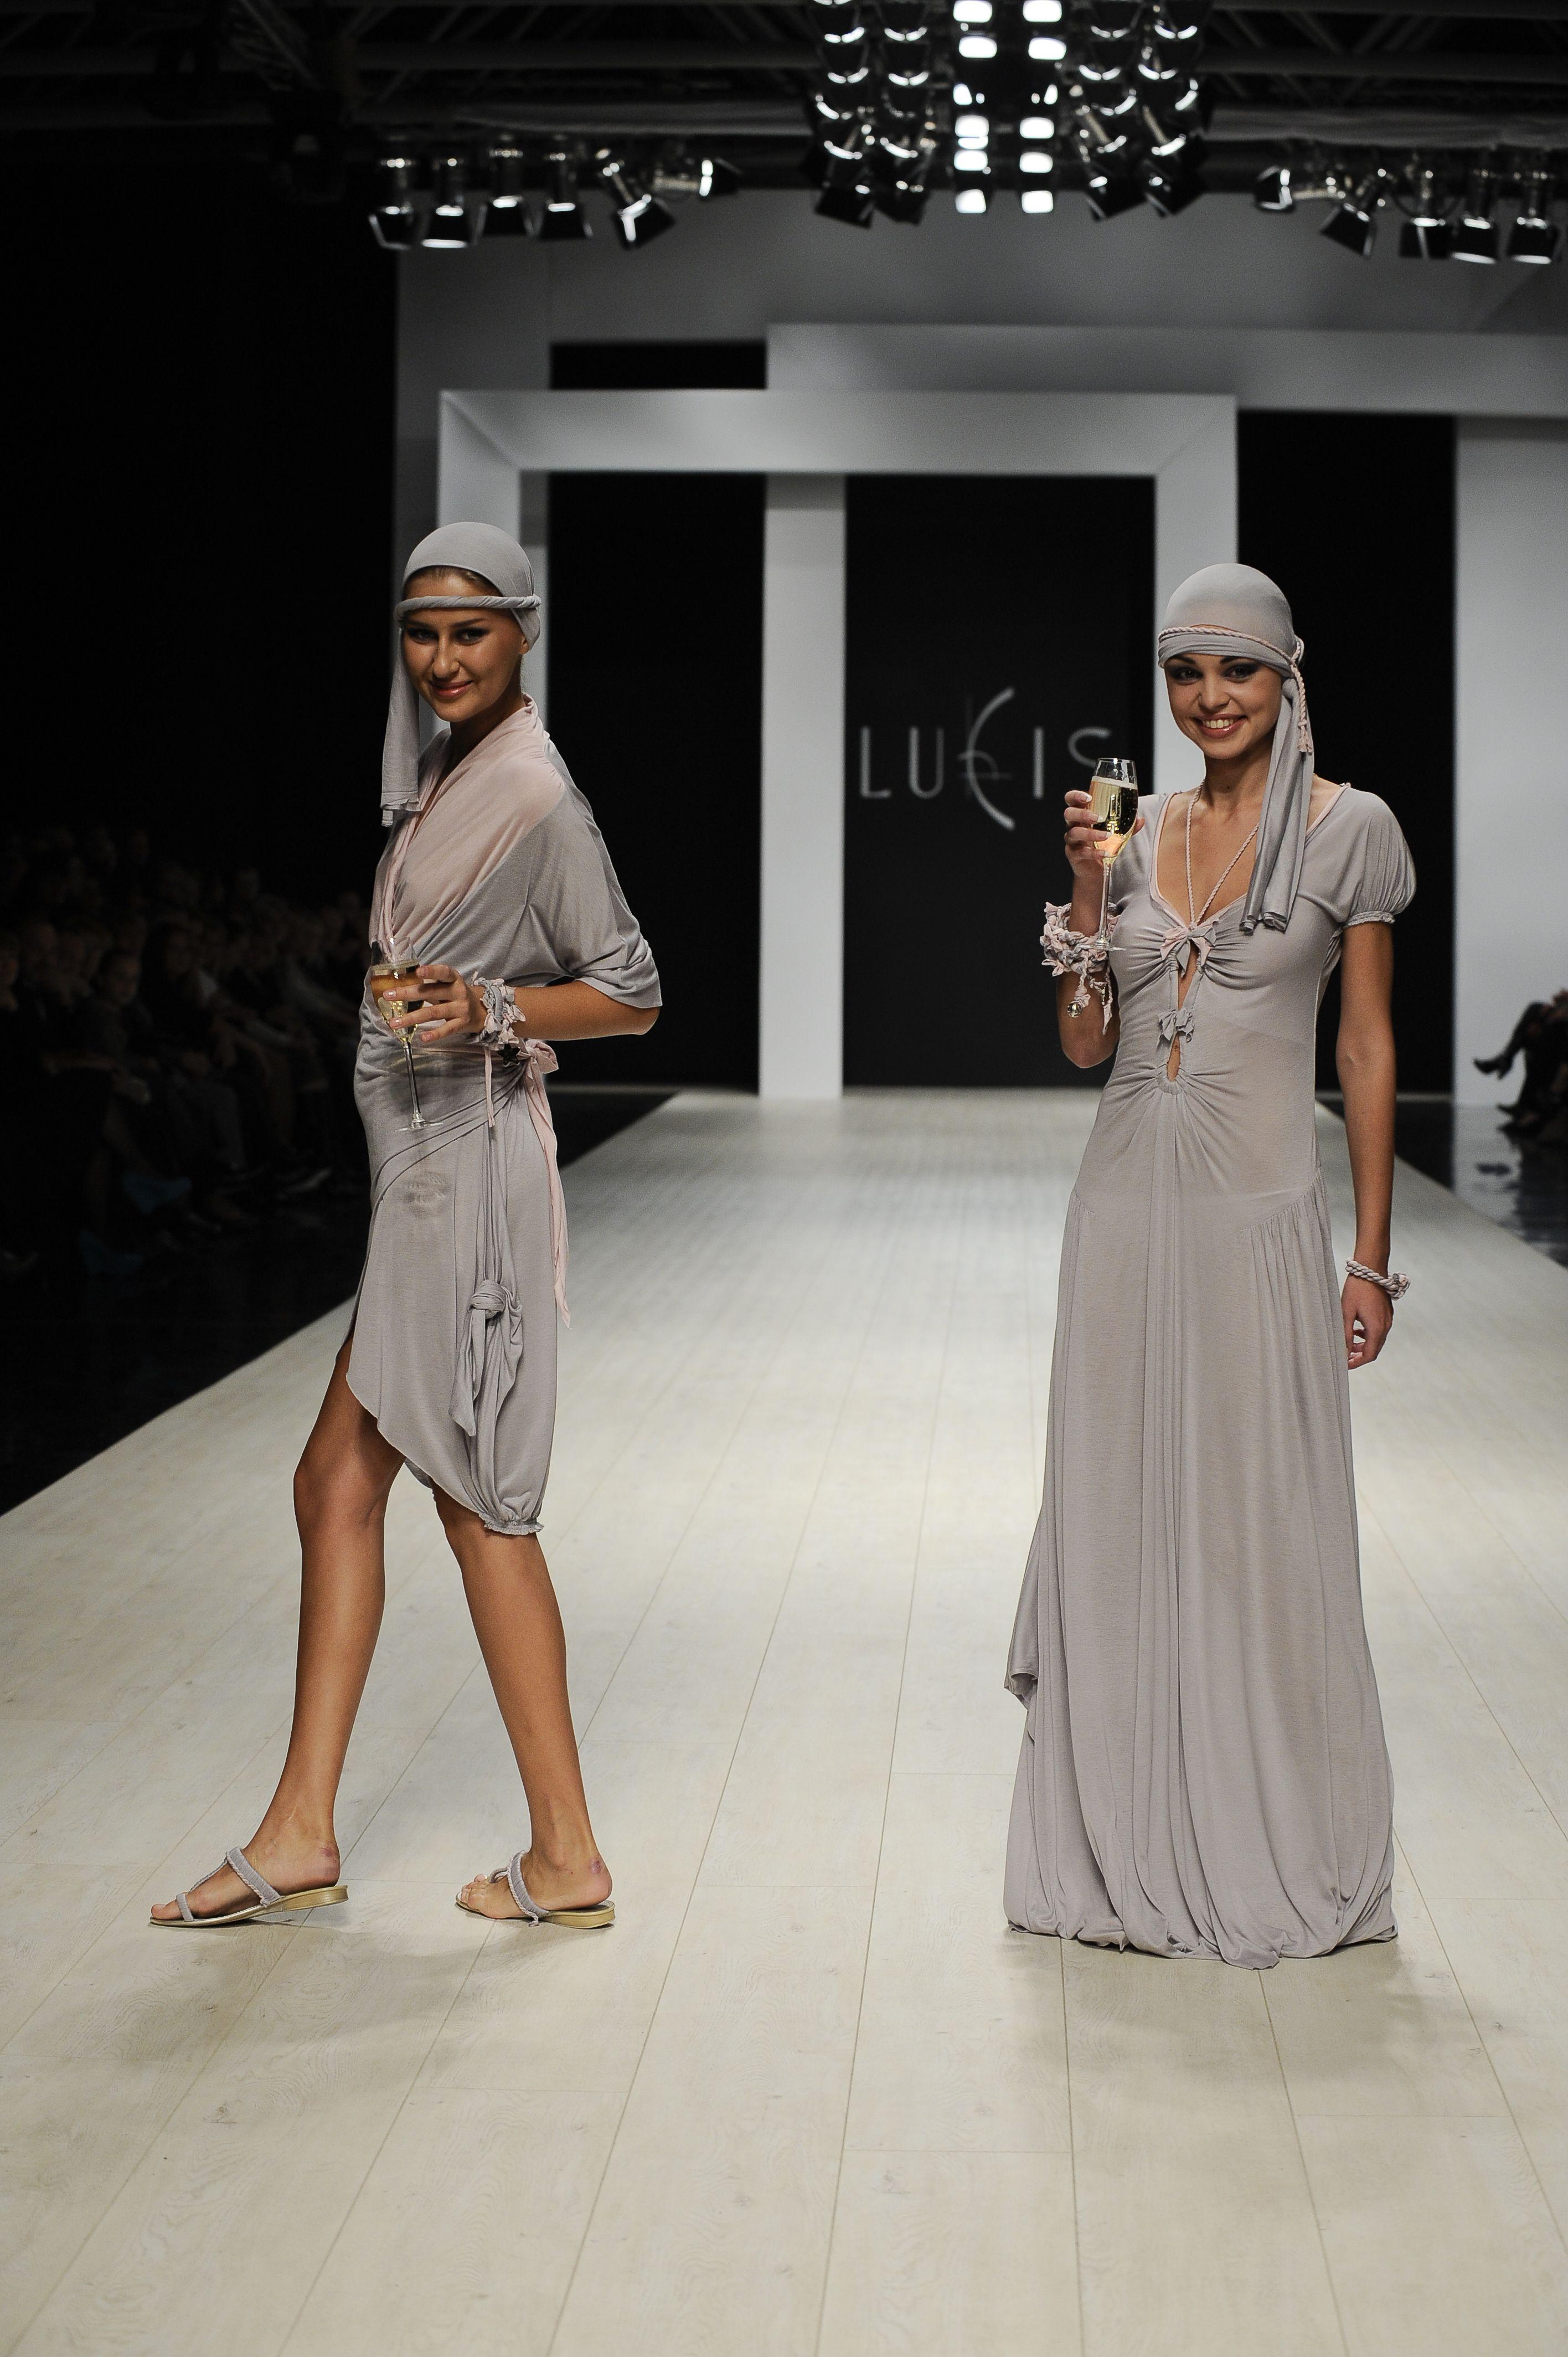 Ludmilakislenko ludmila kislenko dress long dress black